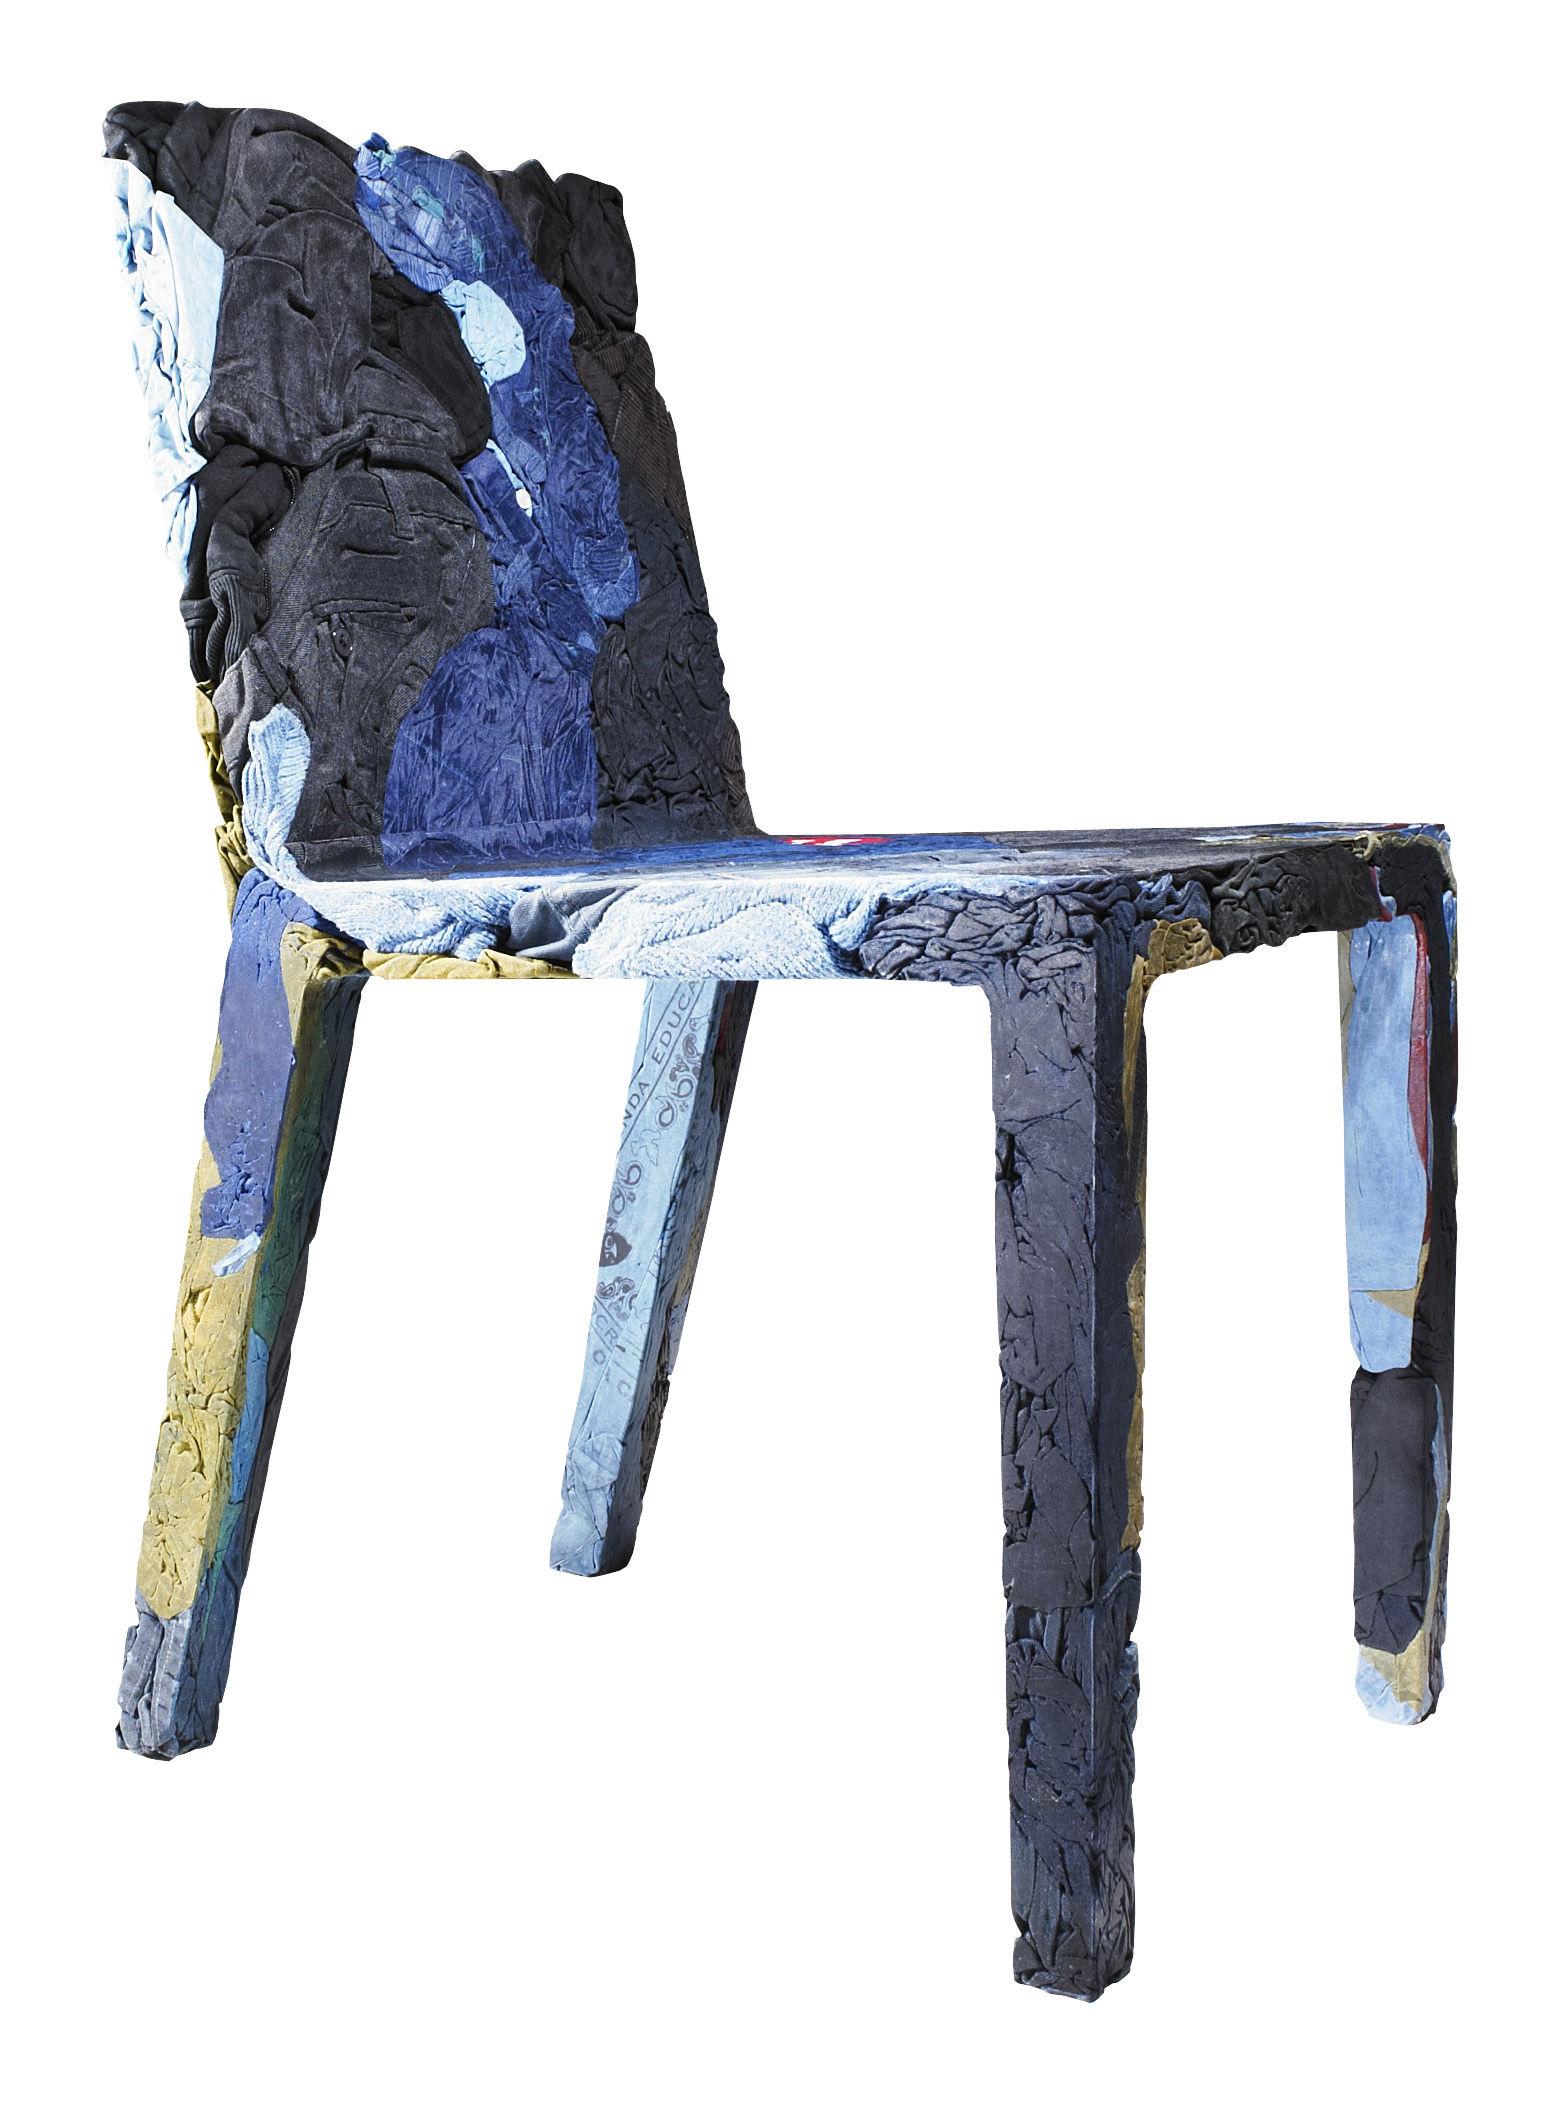 Möbel - Stühle  - Rememberme Stuhl aus recycelten Jeans - Casamania - Jeansfarben - Harz, Jeans recyclés